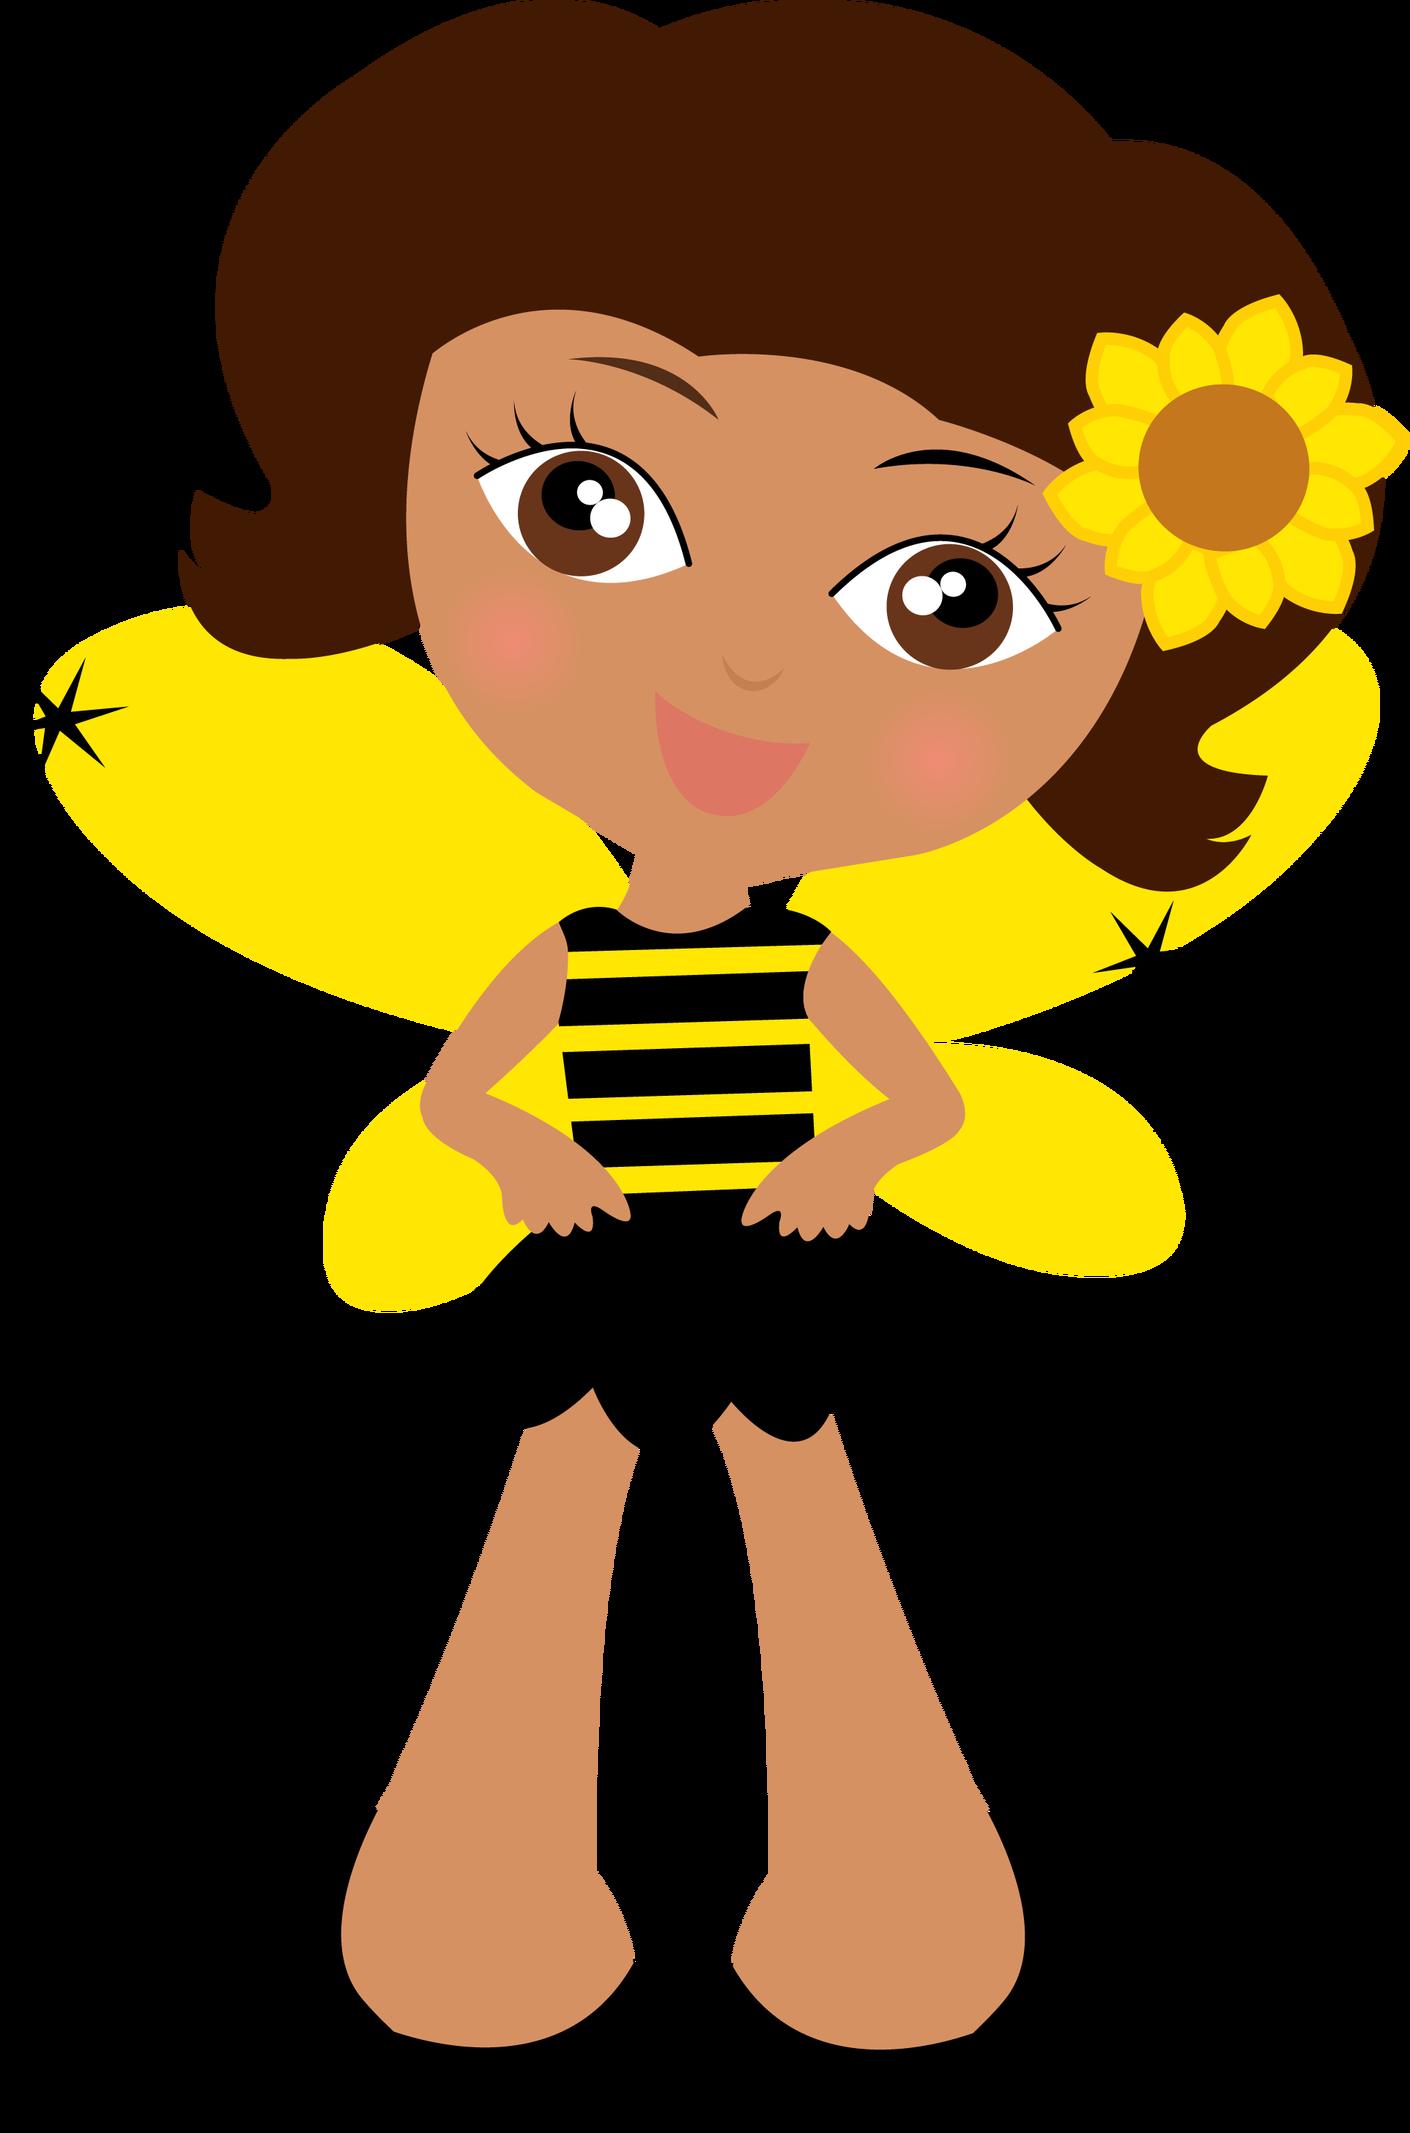 Girly clipart bee. Imagens da abelhinha bees